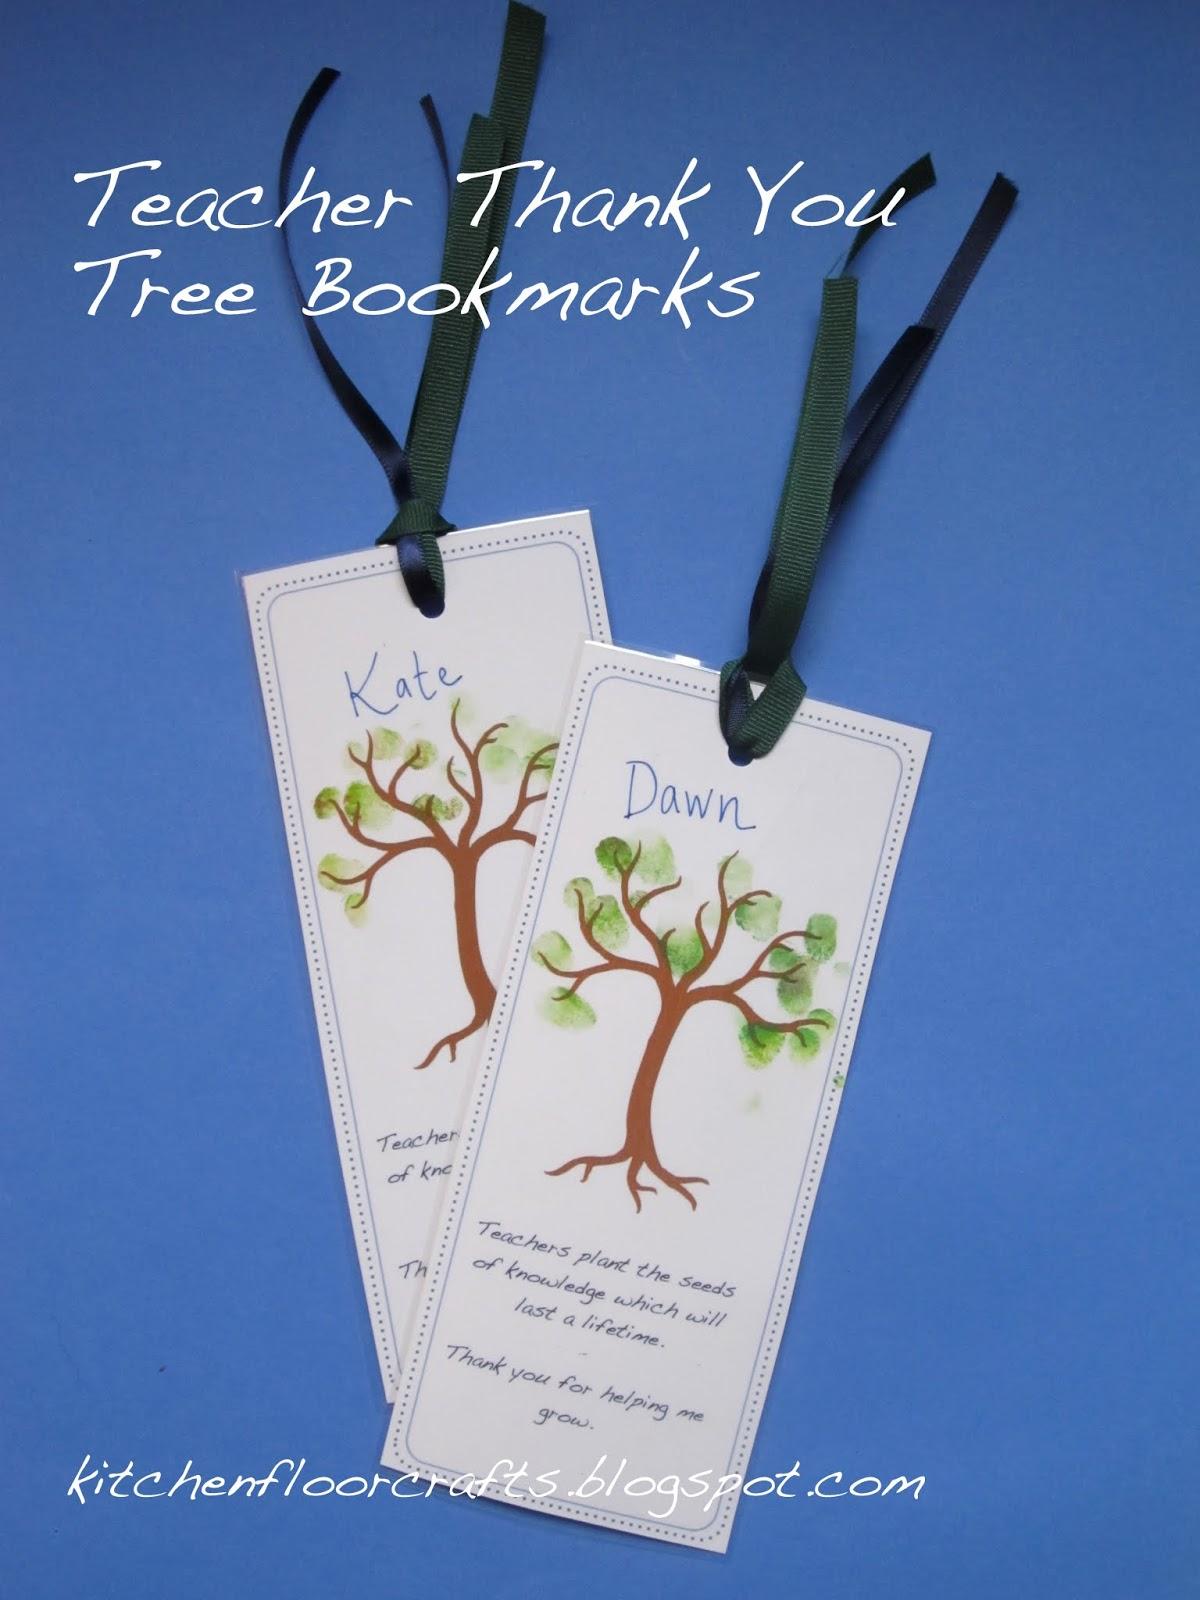 Kitchen Floor Crafts Teacher Thank You Tree Bookmarks Free Printable